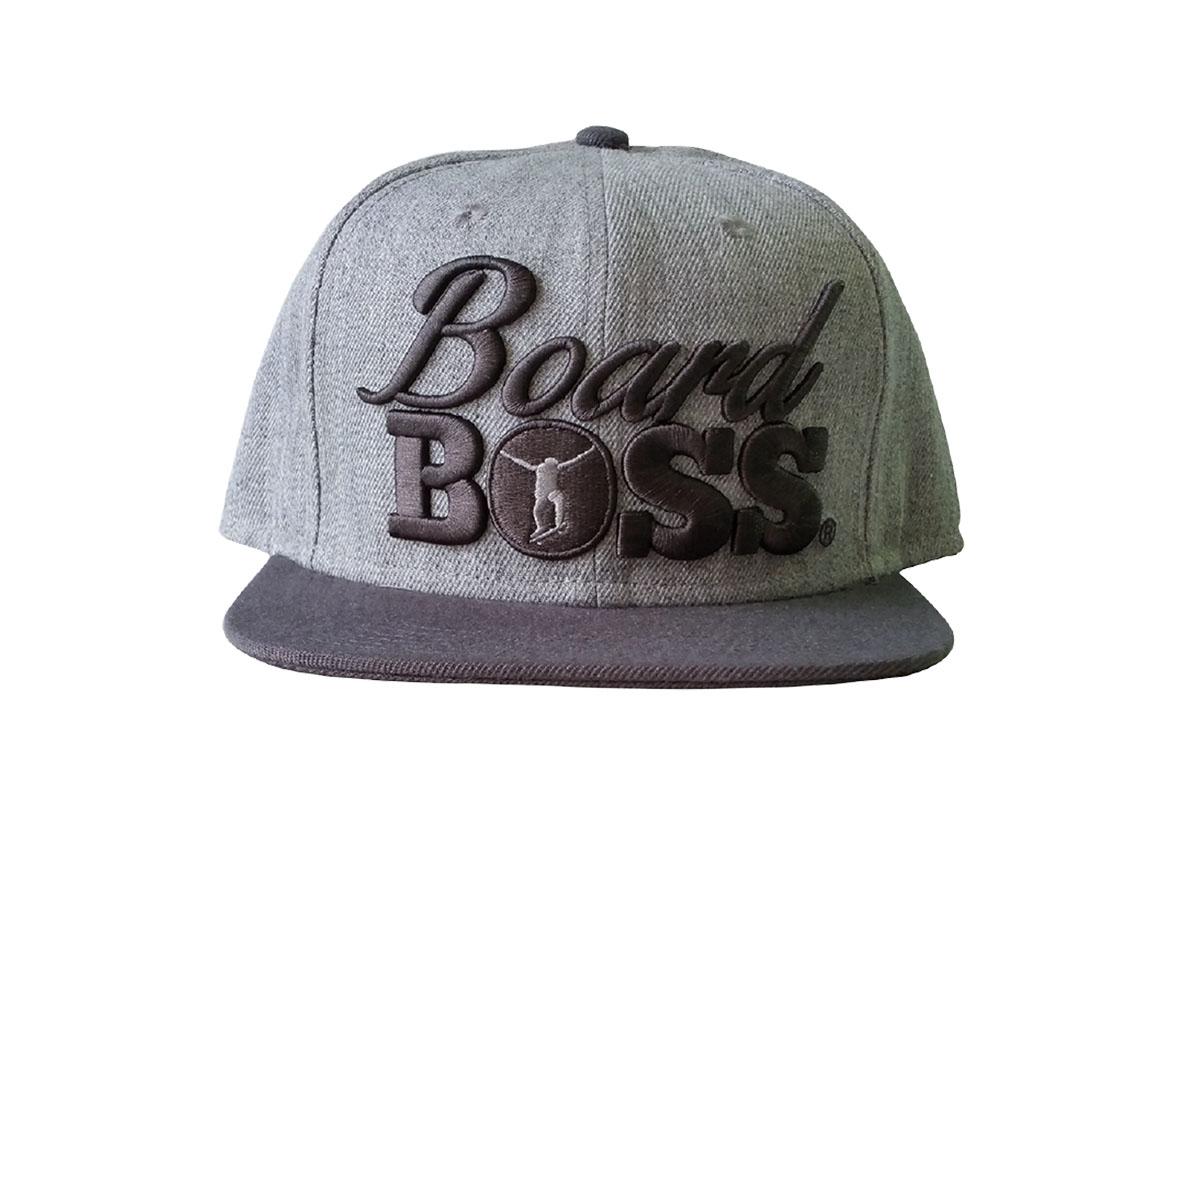 TwentyFour Store embroidery cap facing front